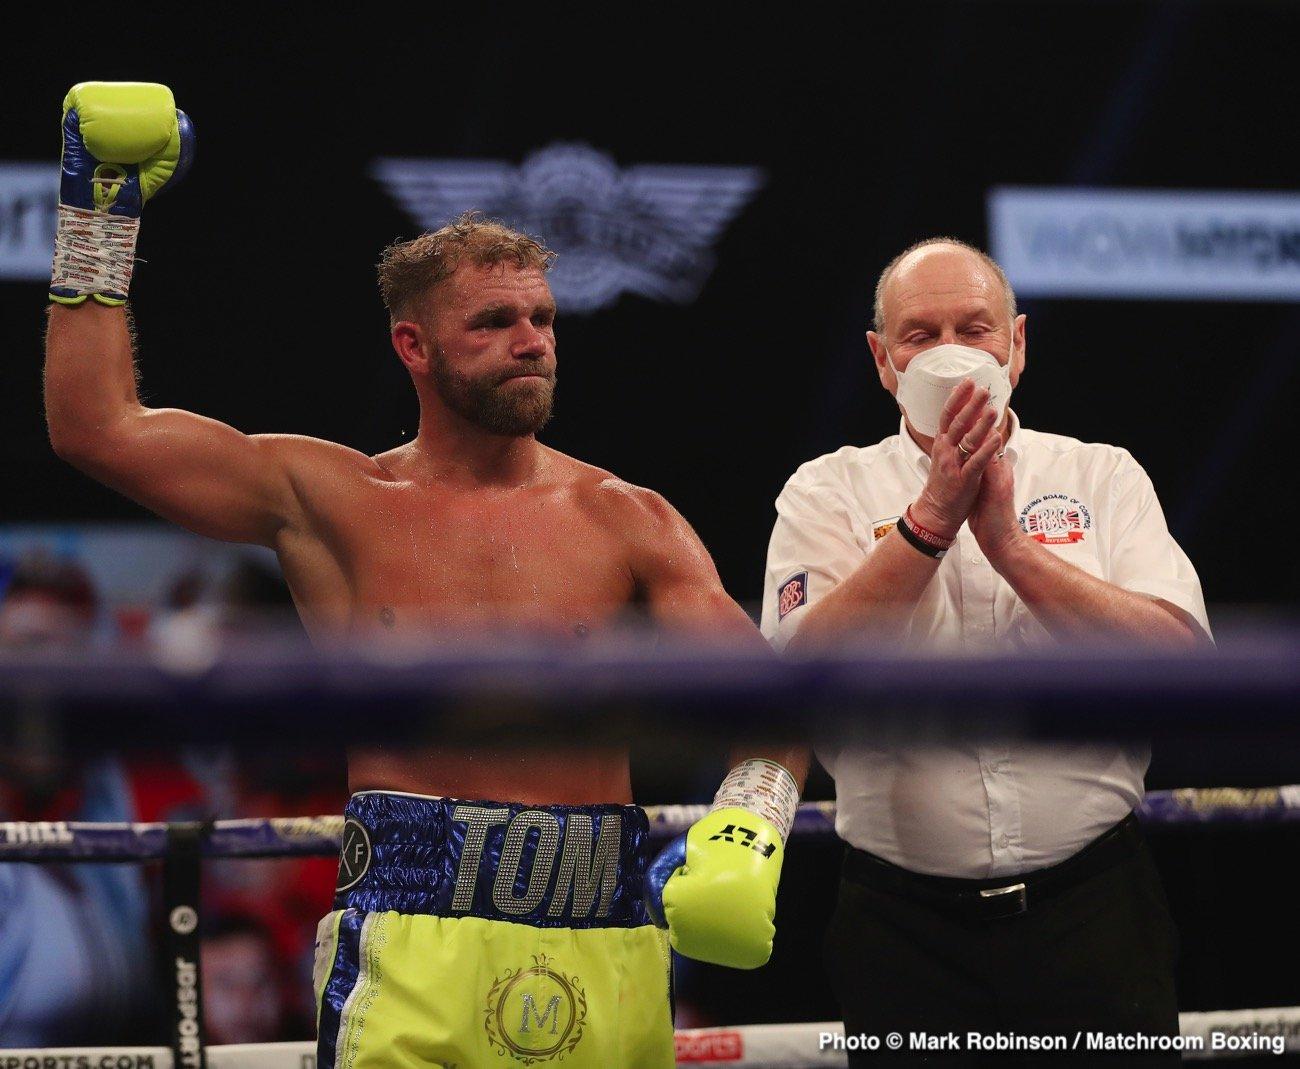 Billy Joe Saunders - Boxing News